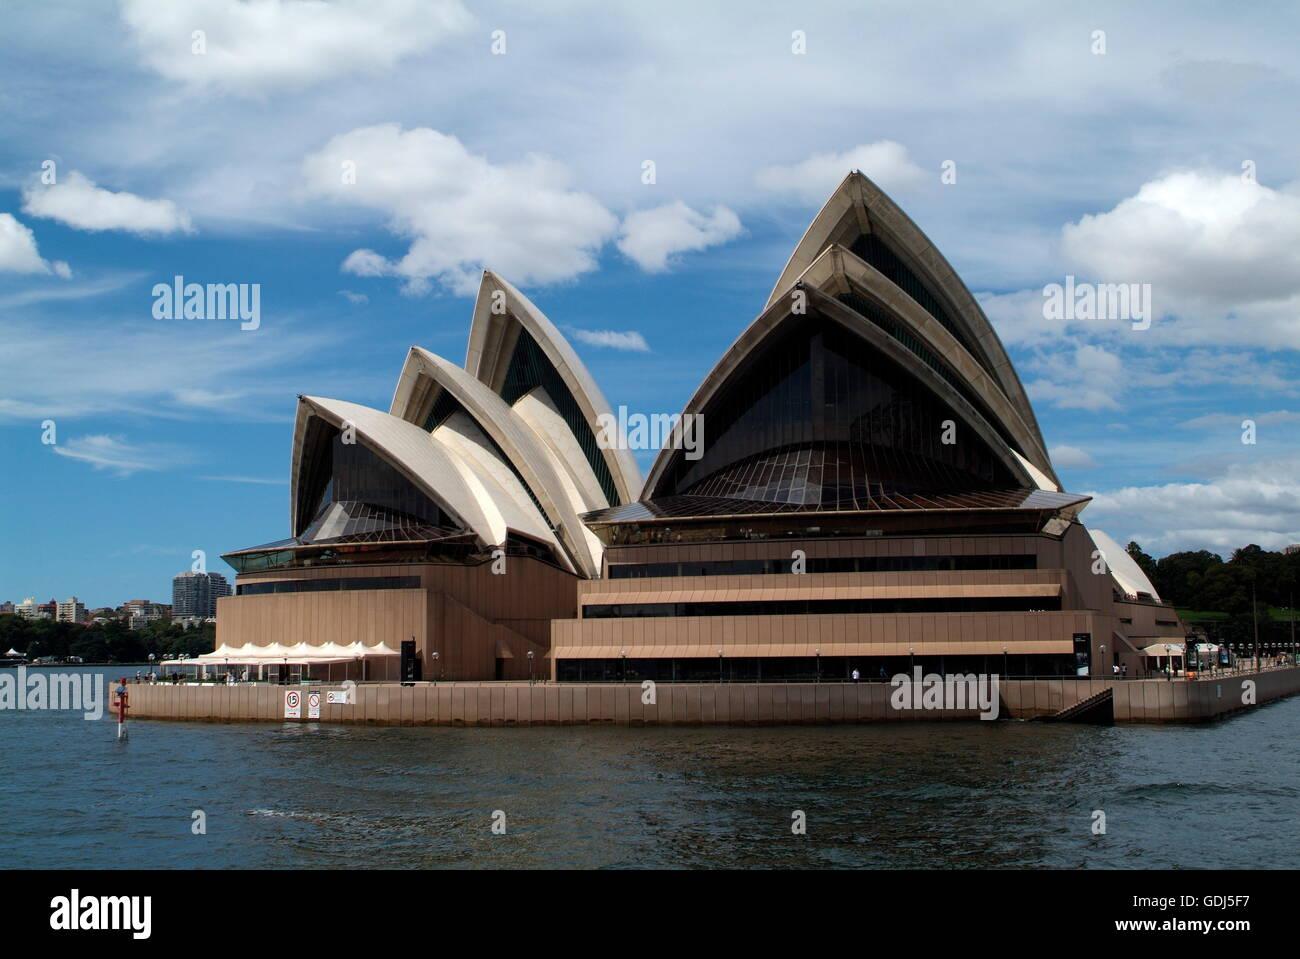 geography / travel, Australia, Sydney, buildings, Sydney Opera House, built: 1959 - 1973 by Jorn Utzon, exterior - Stock Image